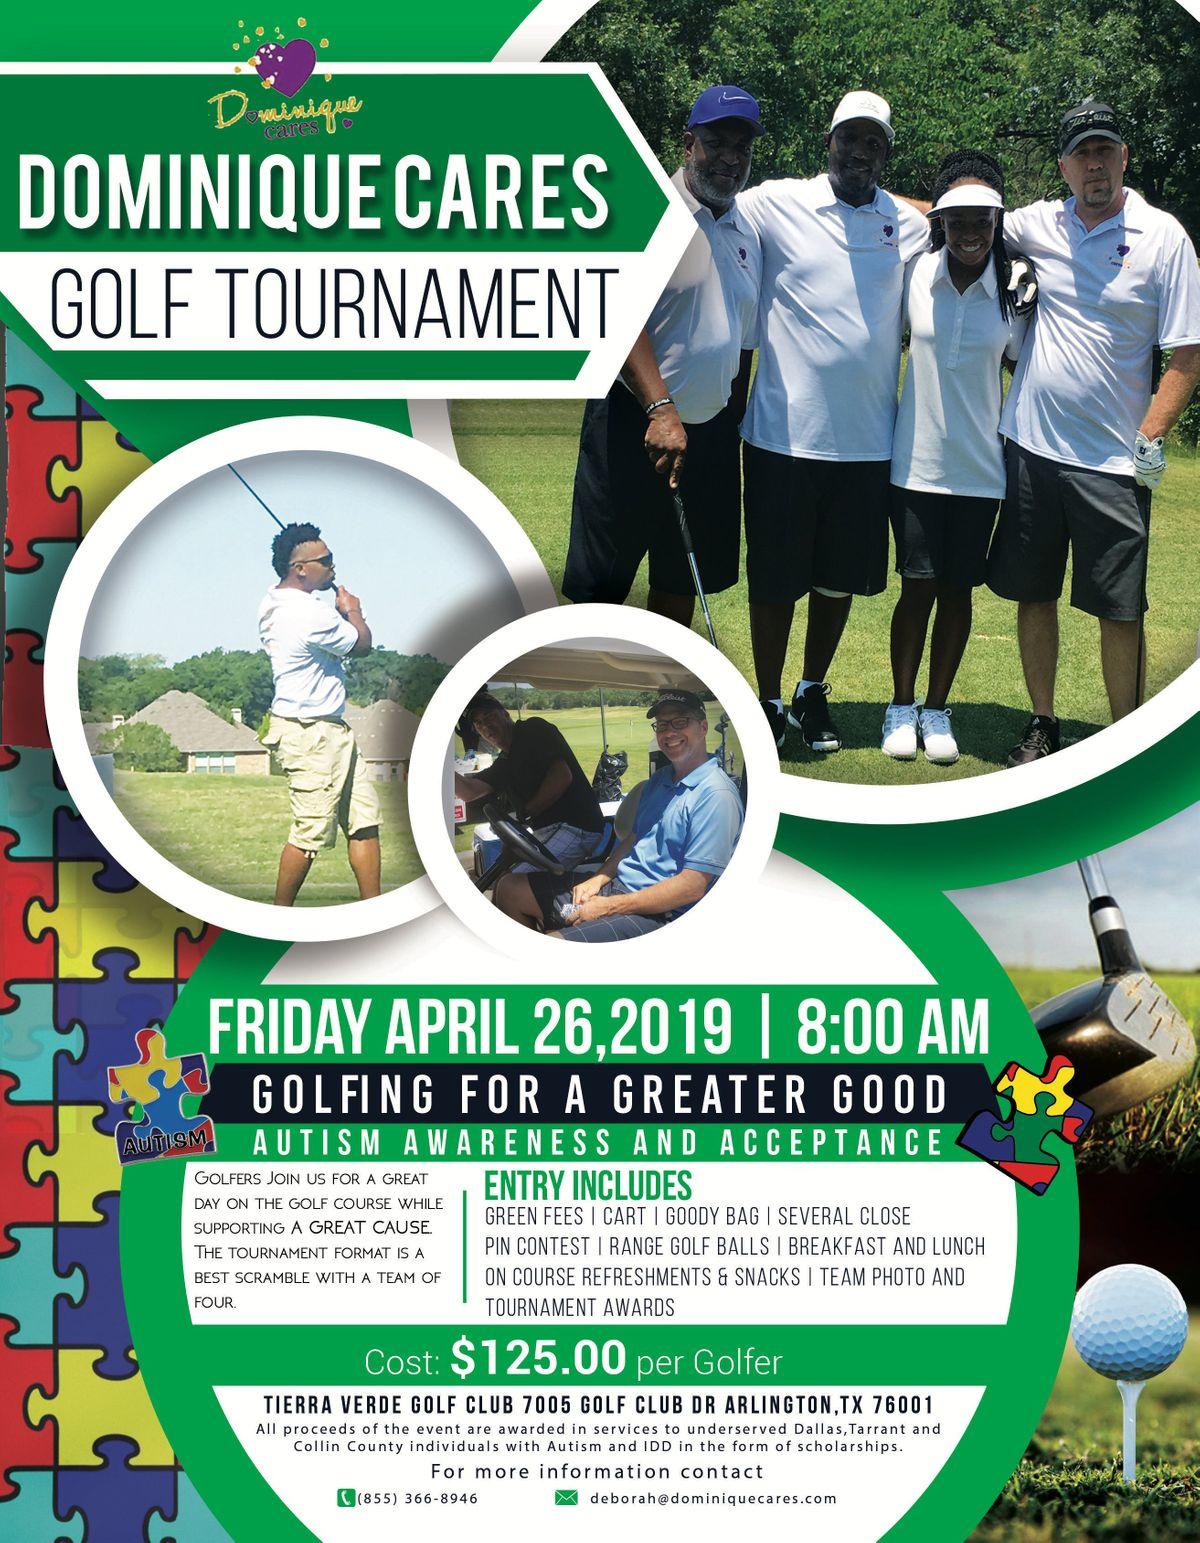 Dominique Cares Golf Tournament